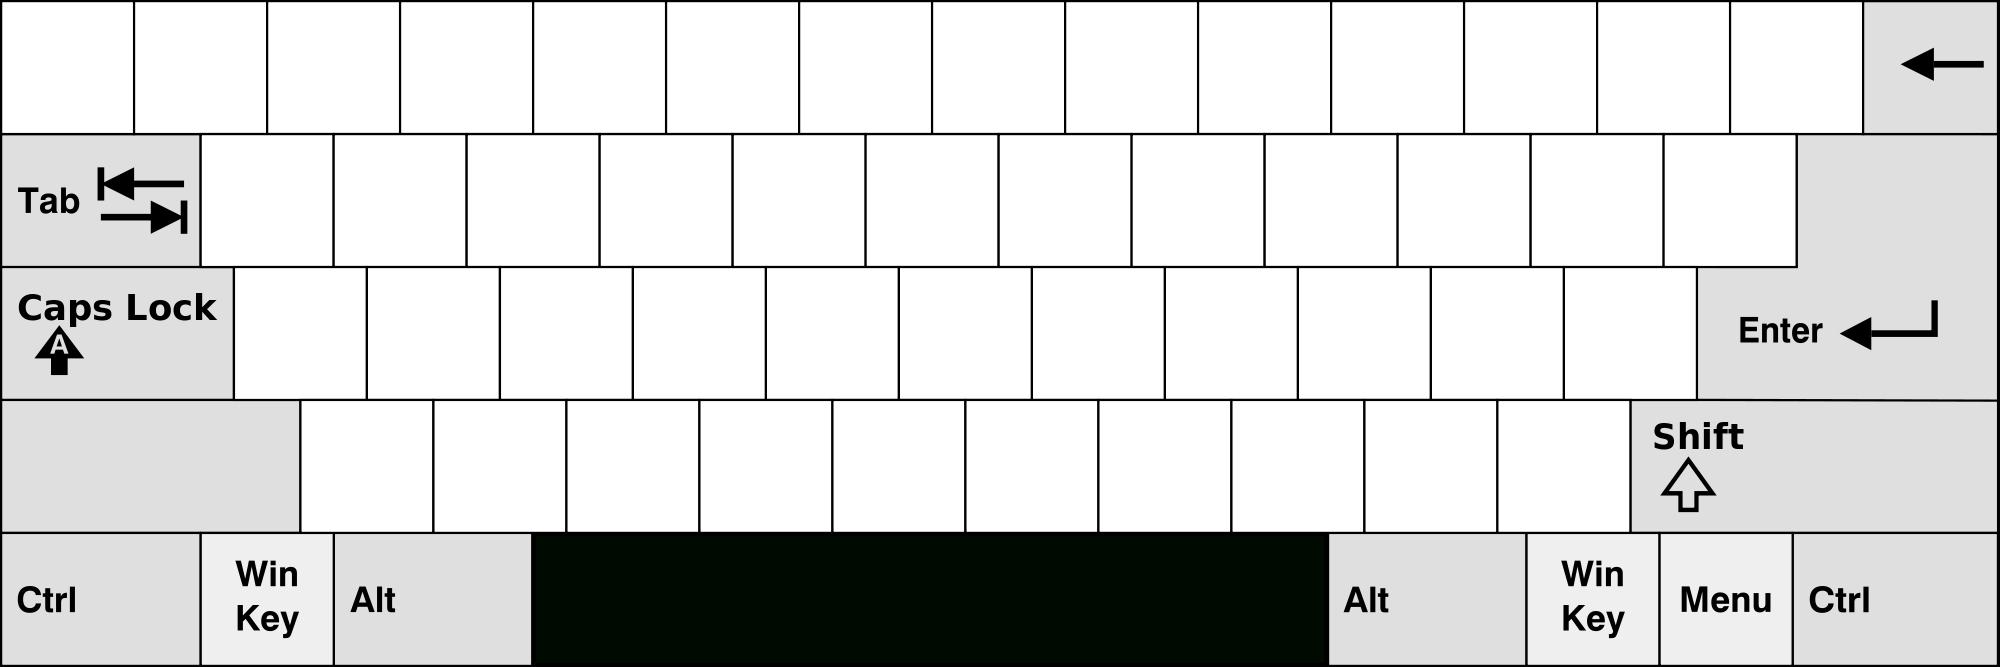 Printable Computer Keyboard Template. Keyboard Template Printable | Blank Keyboard Worksheet Printable